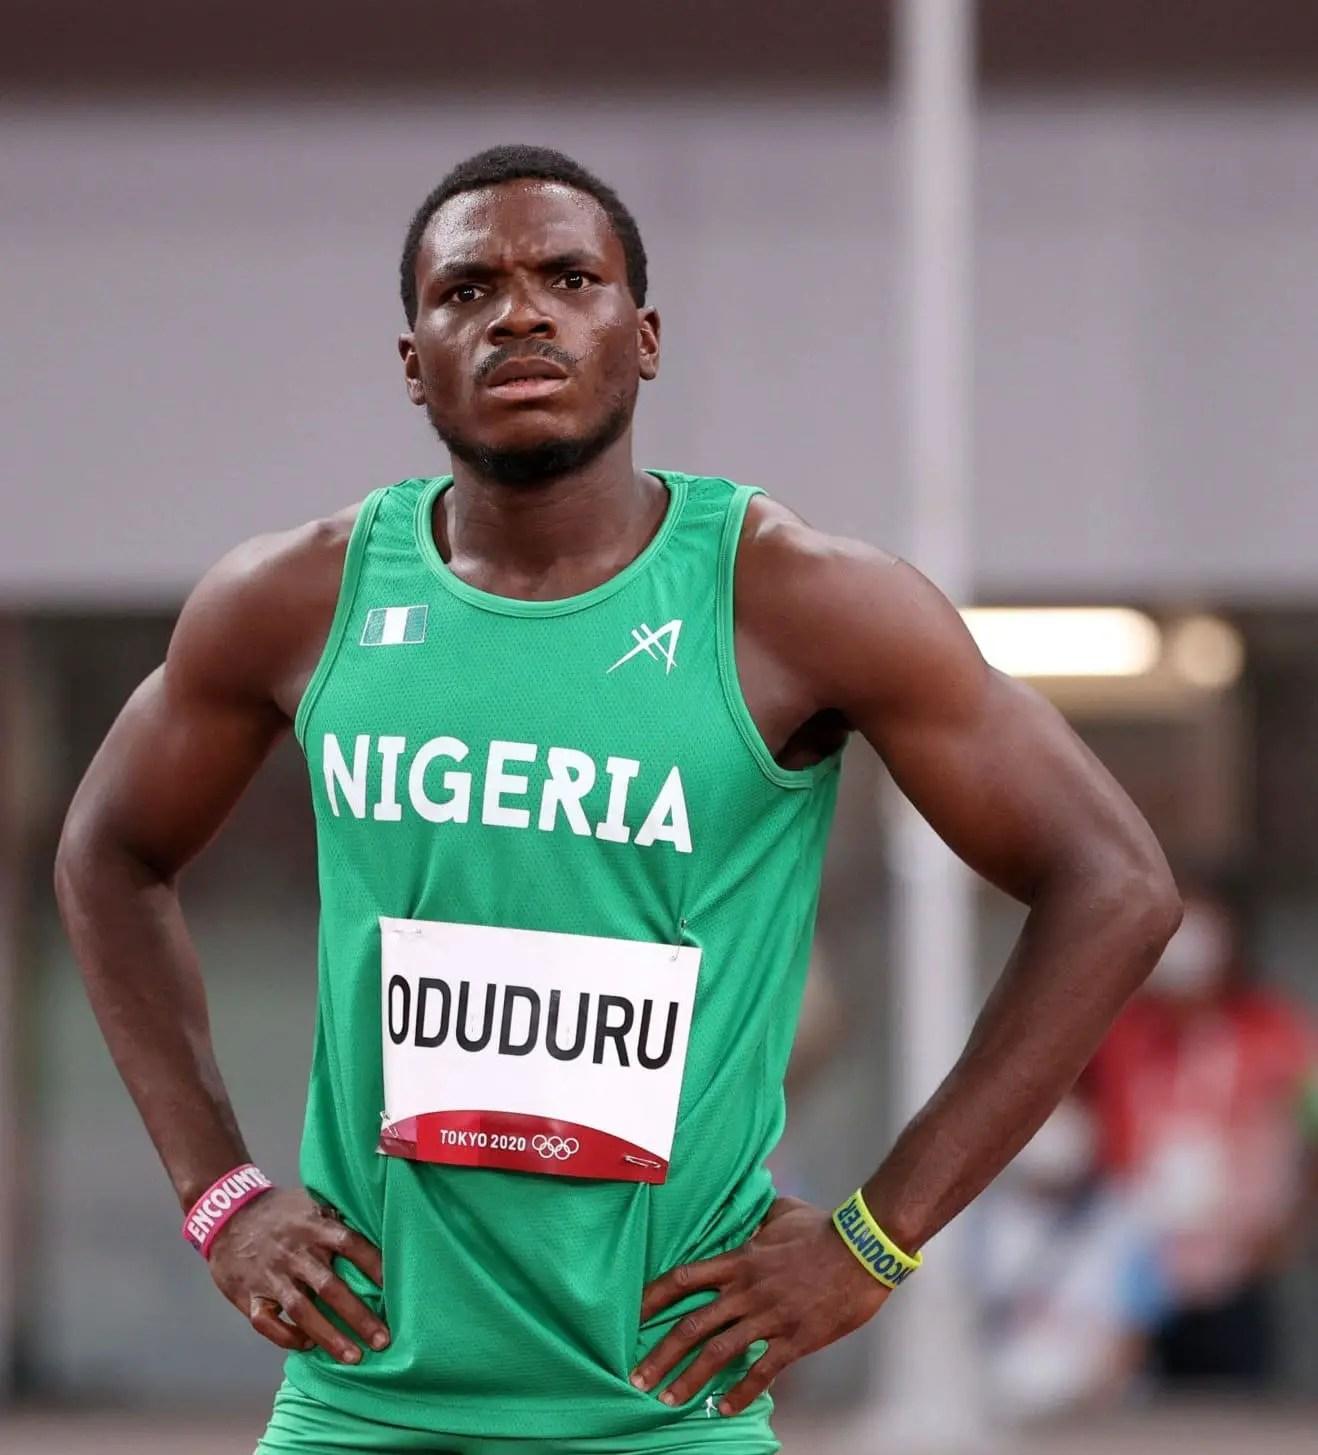 Tokyo 2020 : Divine Oduduru Fails To Make Men's 200m Final